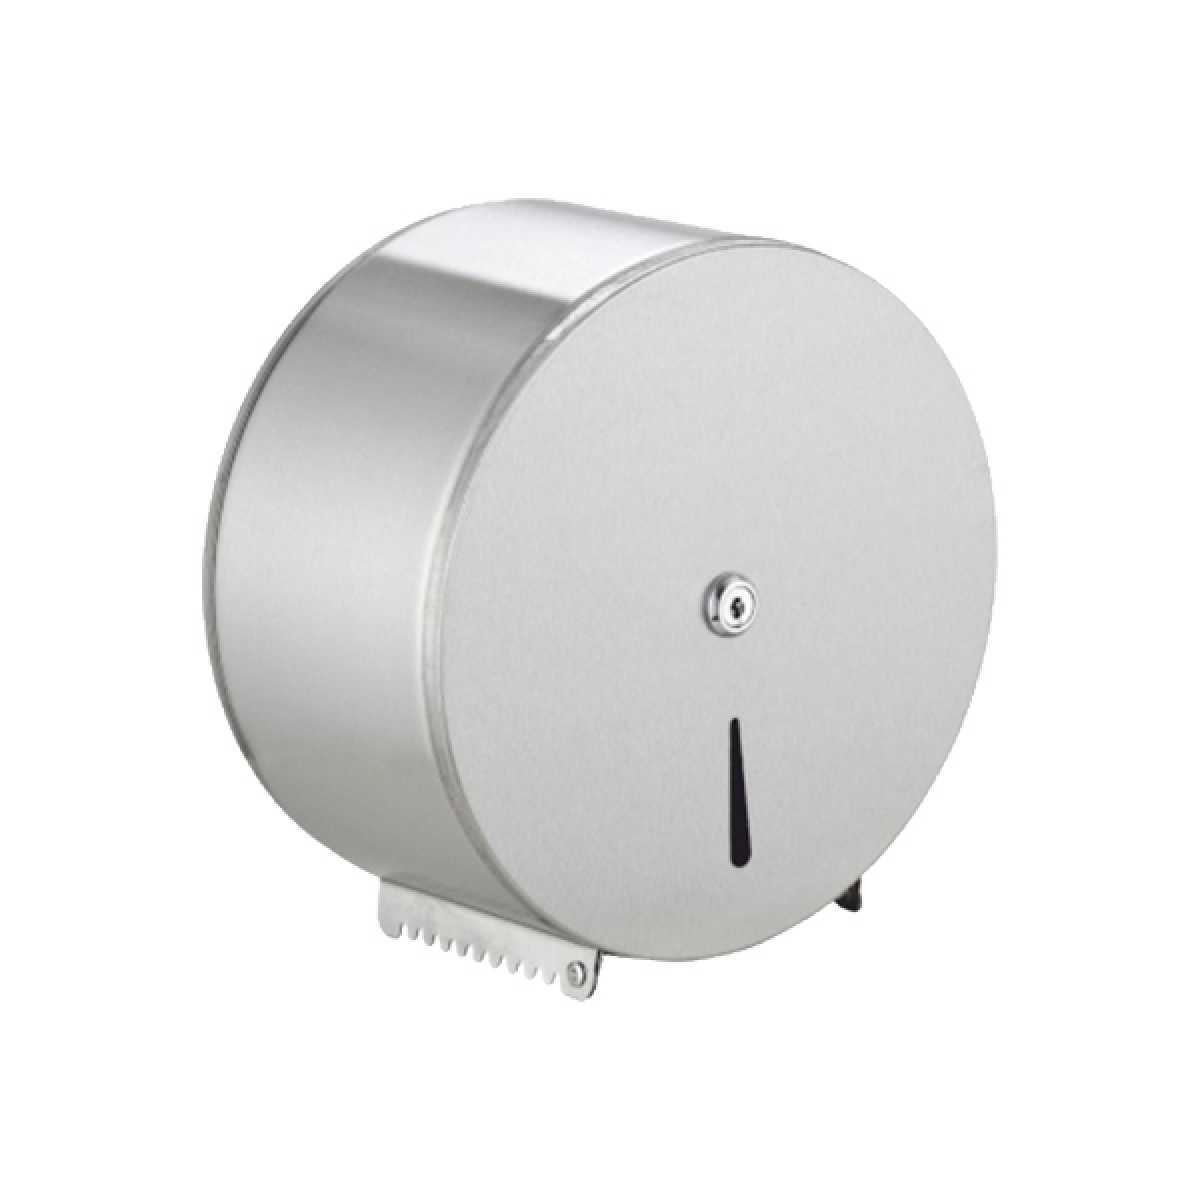 Mini Jumbo WC Kağıt Verici